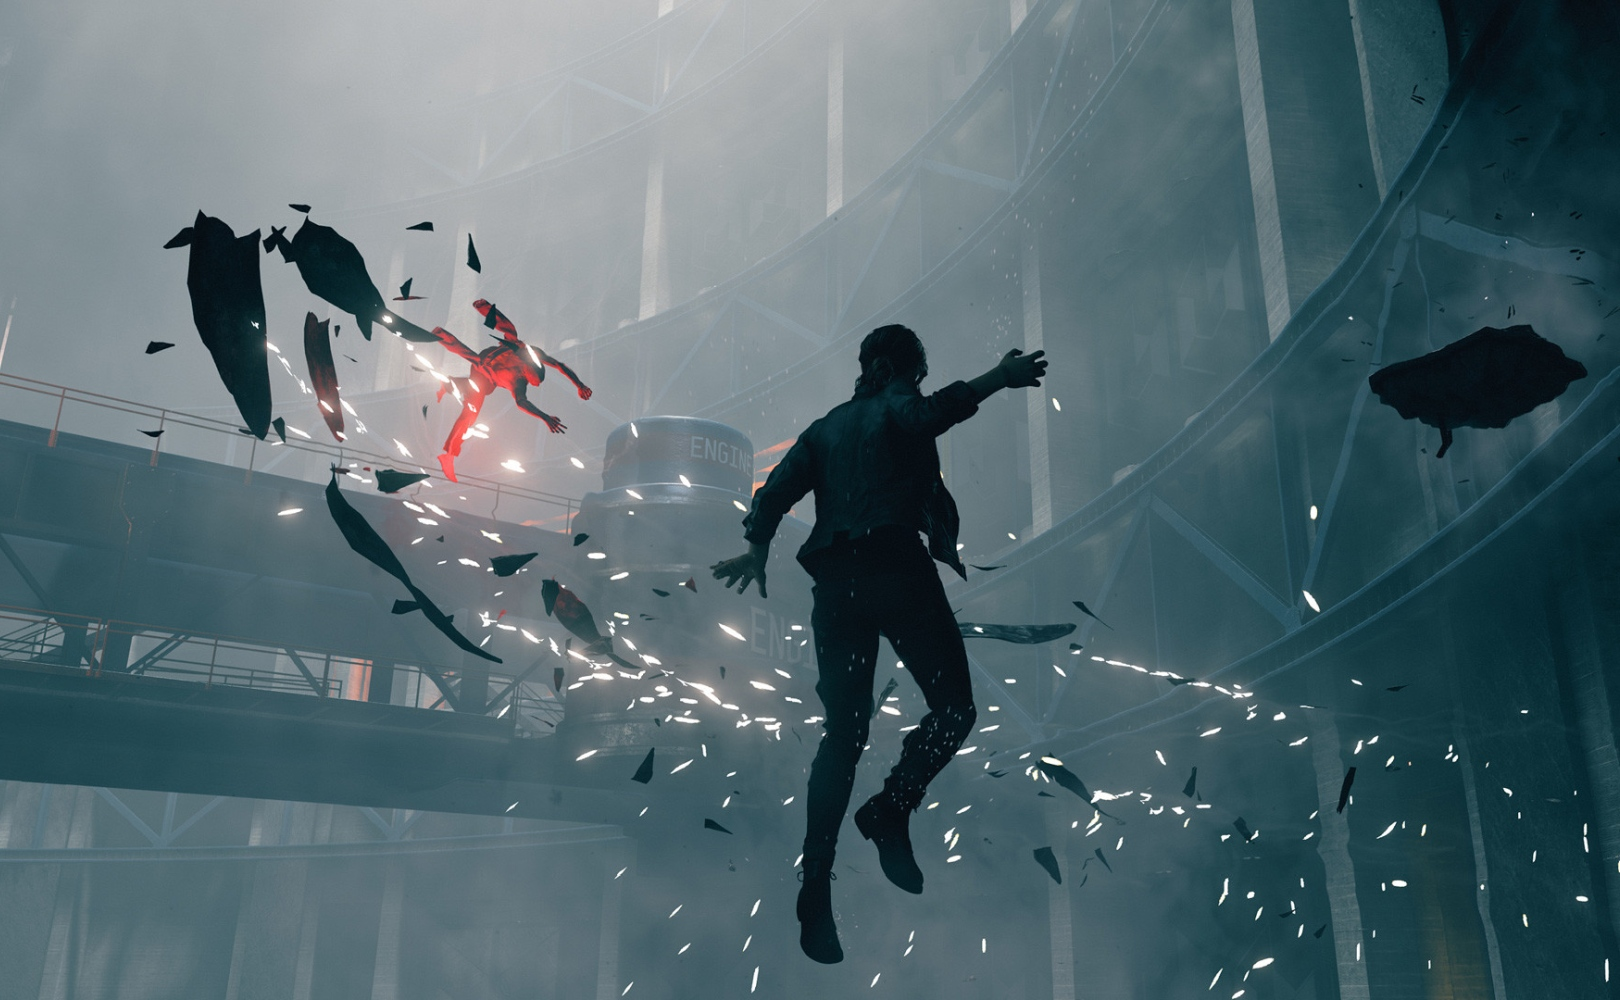 Control i Genshin Impact za darmo na Epic Games Store